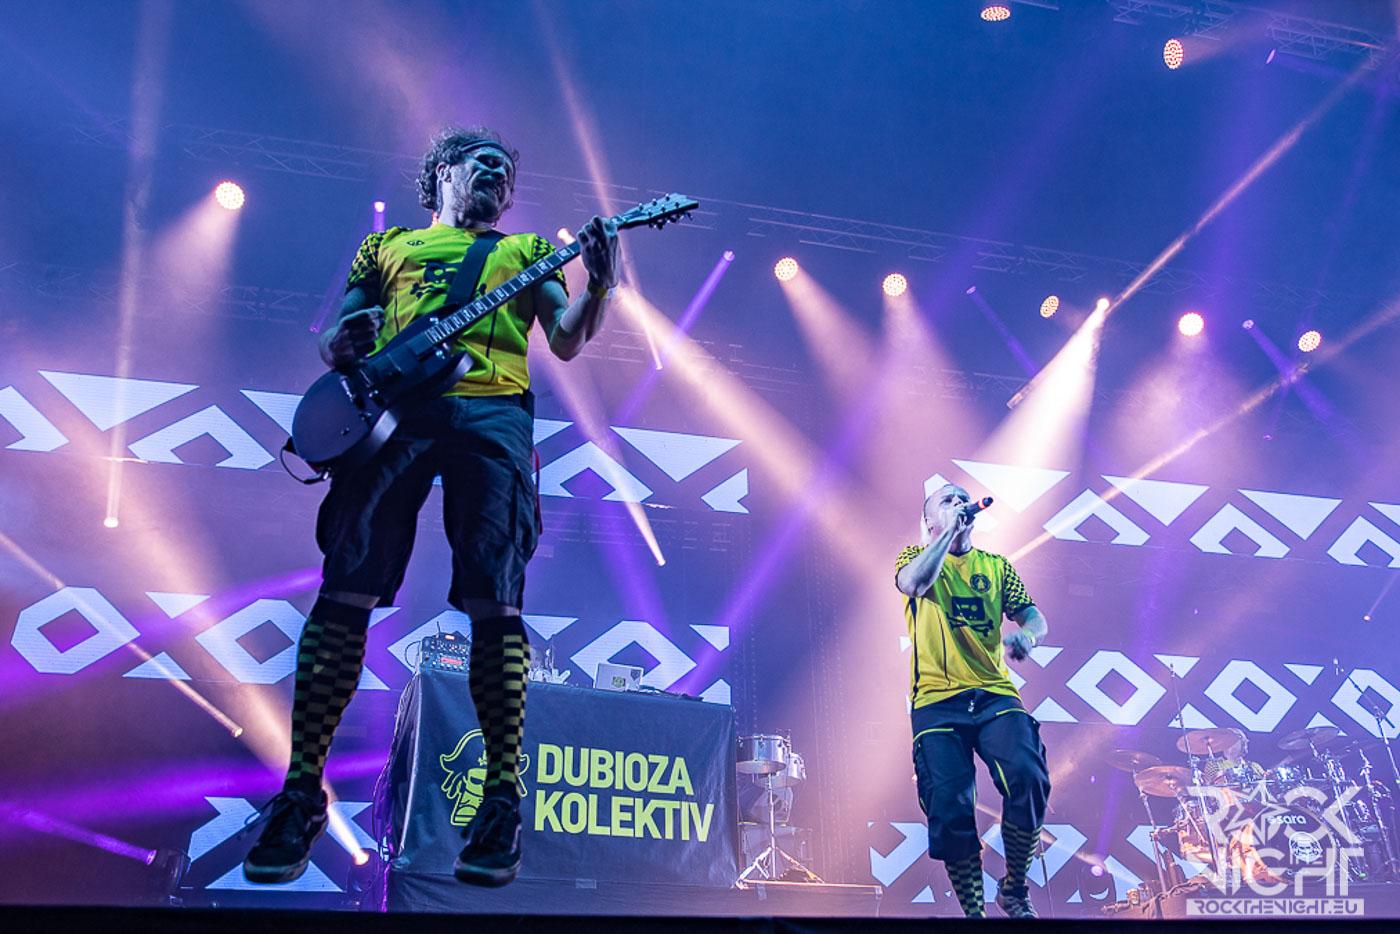 Dubioza Kolektiv @ Arena Armeets, 2019